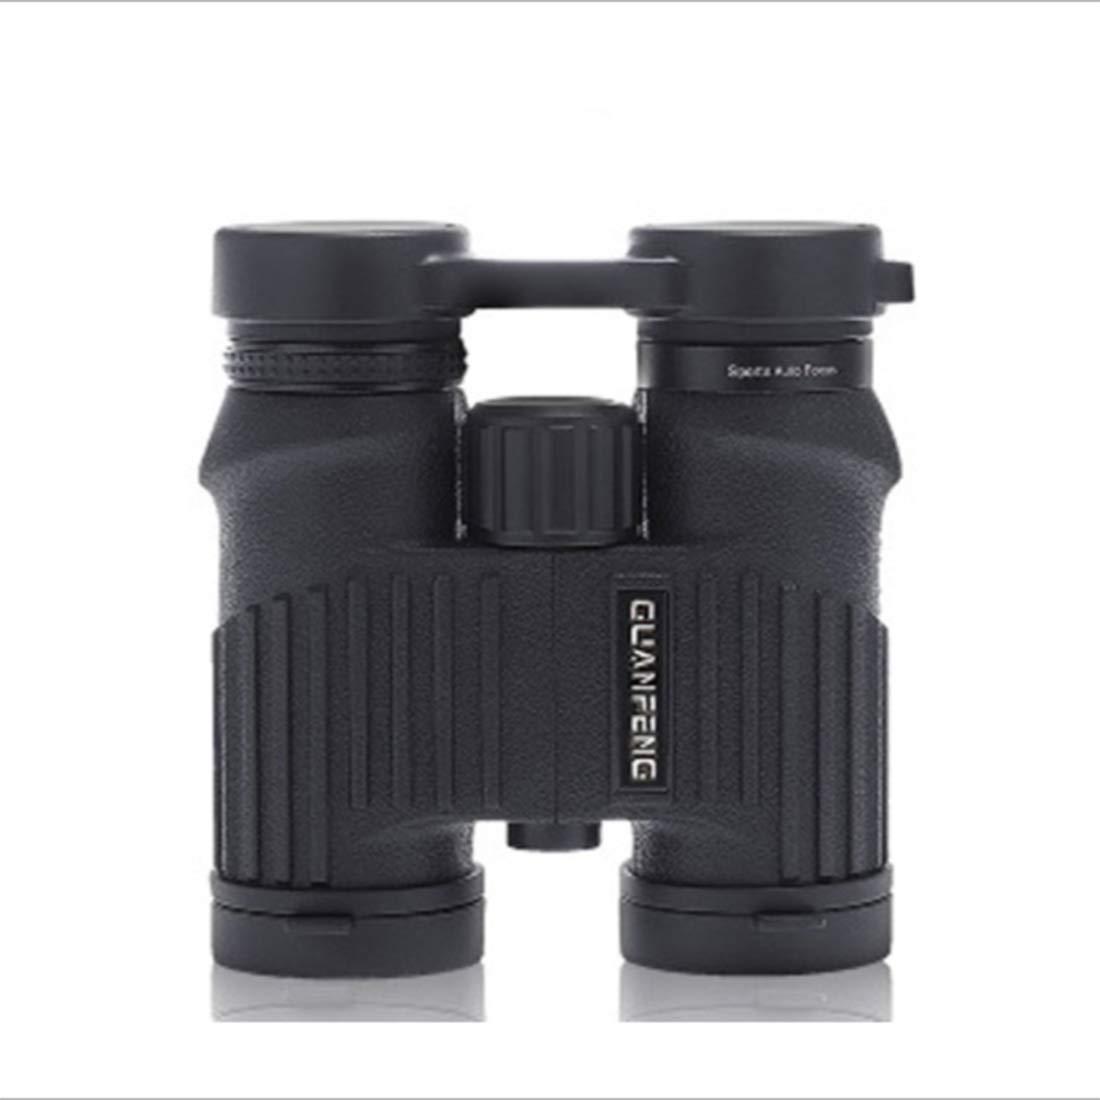 JPAKIOS 屋外用双眼鏡ストレート高精細低照度ナイトビジョン屋外望遠鏡 (Color : ブラック)  ブラック B07PLQKTJM